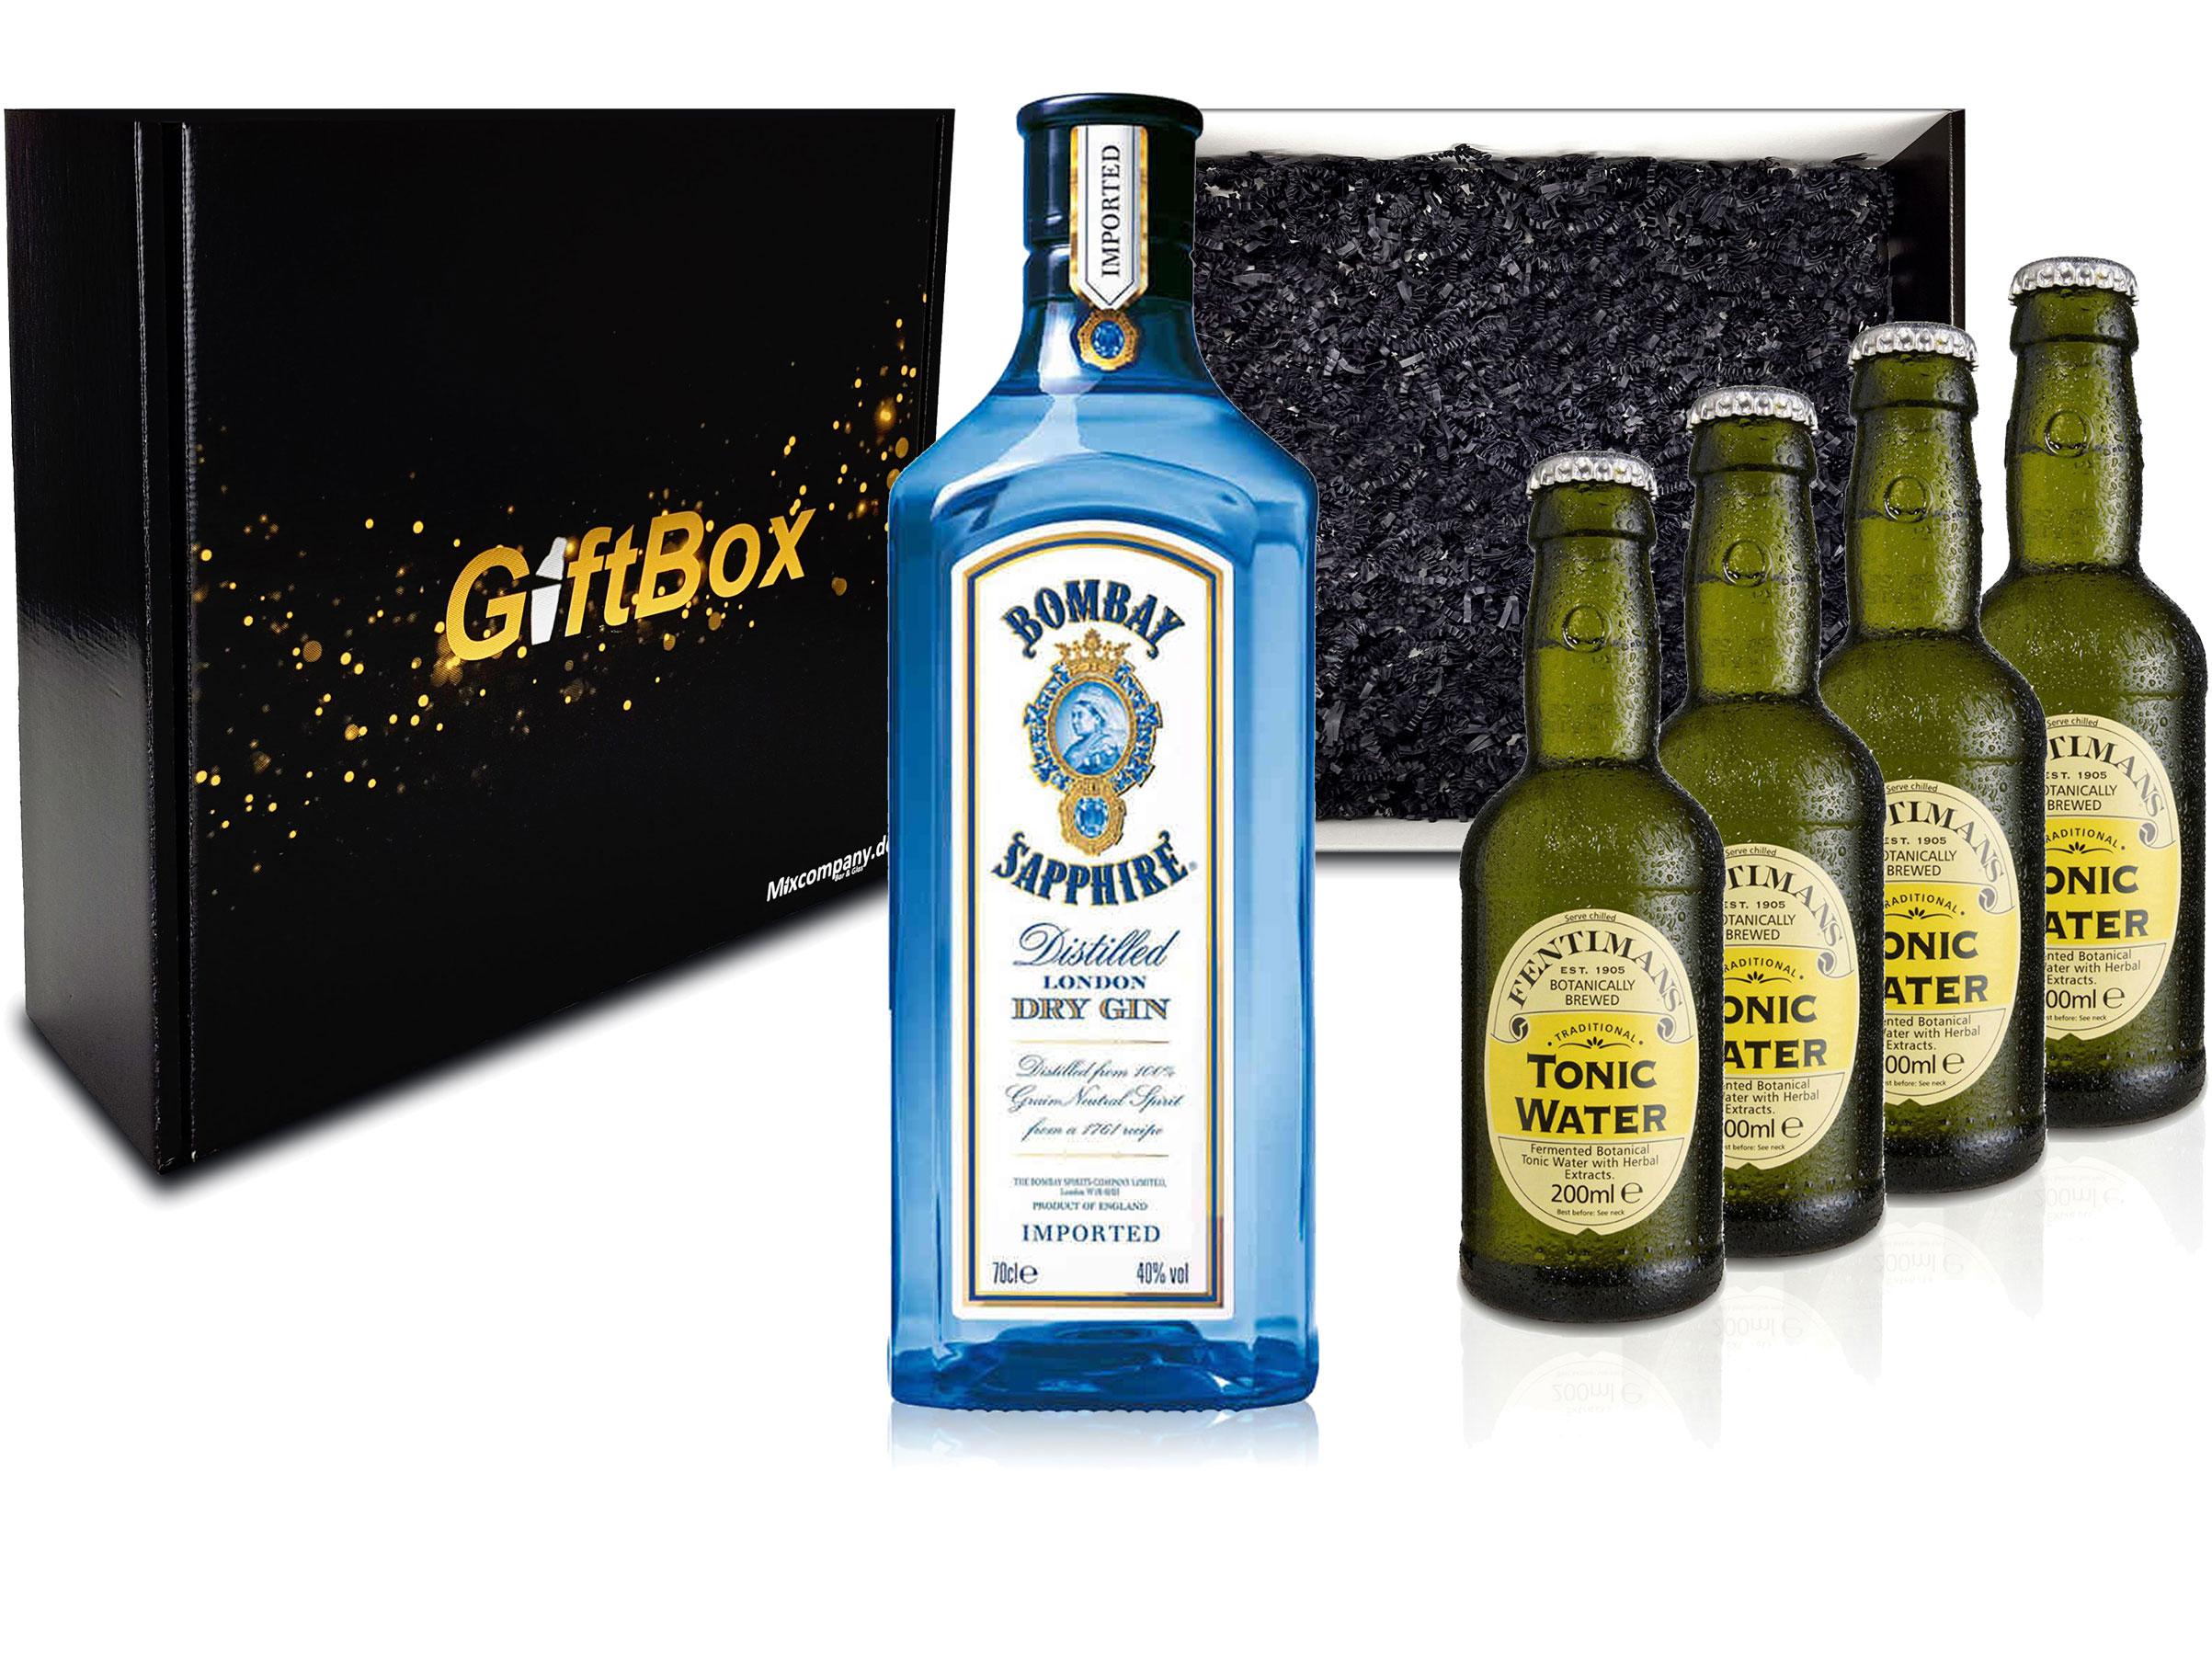 Gin Tonic Giftbox Geschenkset - Bombay Sapphire 0,7l 700ml (40% Vol) + 4x Fentimans Tonic Water 200ml inkl. Pfand MEHRWEG + Geschenkverpackung